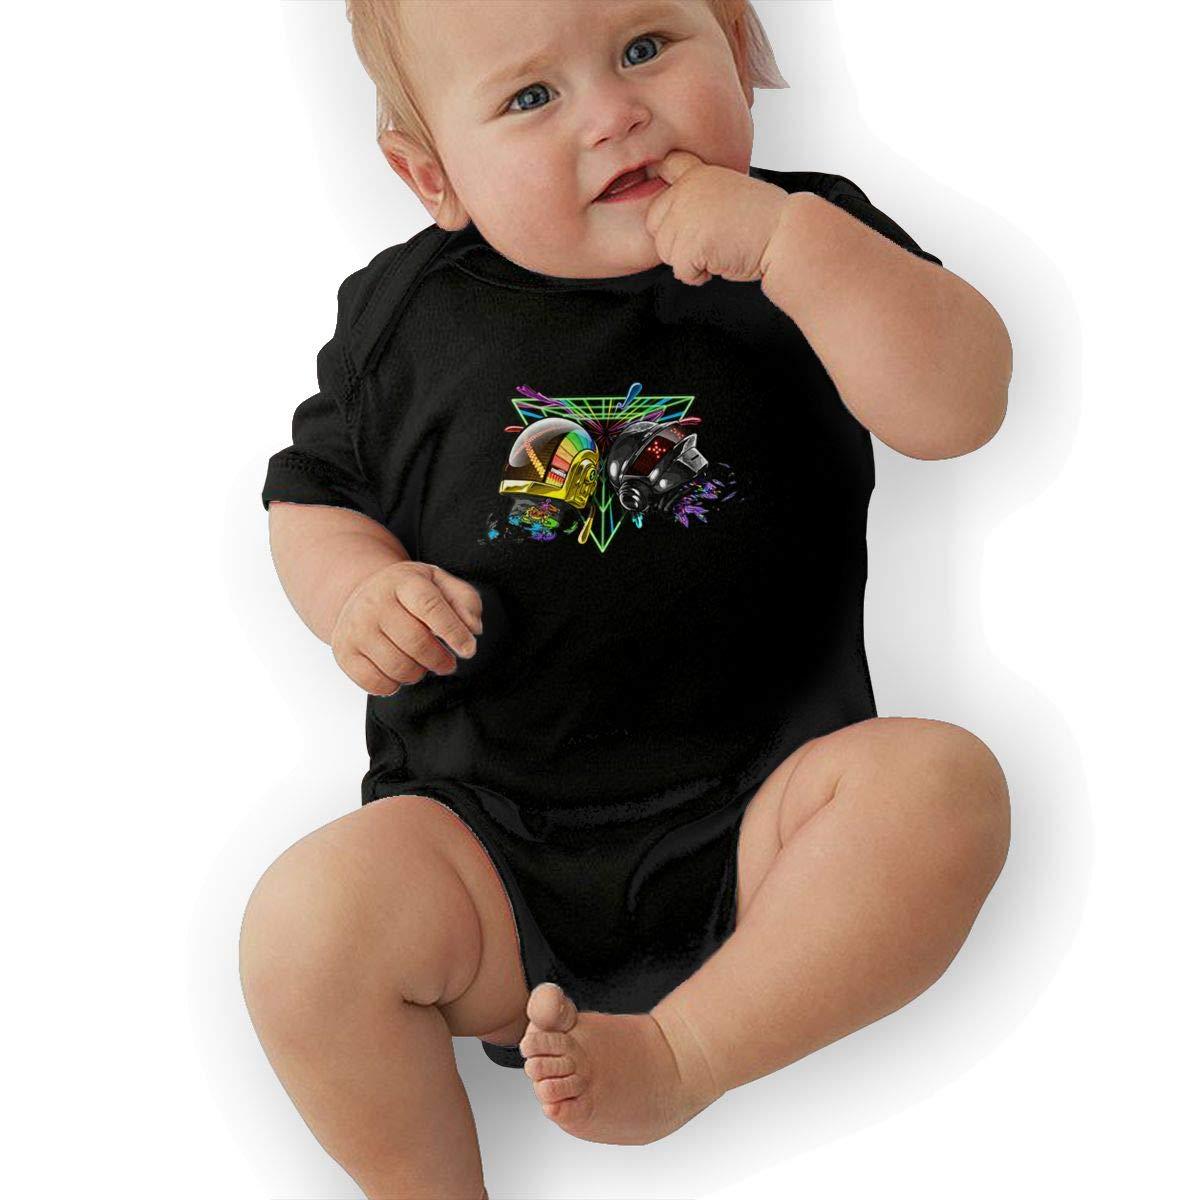 LuckyTagy Daft Punk Unisex Particular Boys /& Girls Romper Baby BoyTank Tops Black